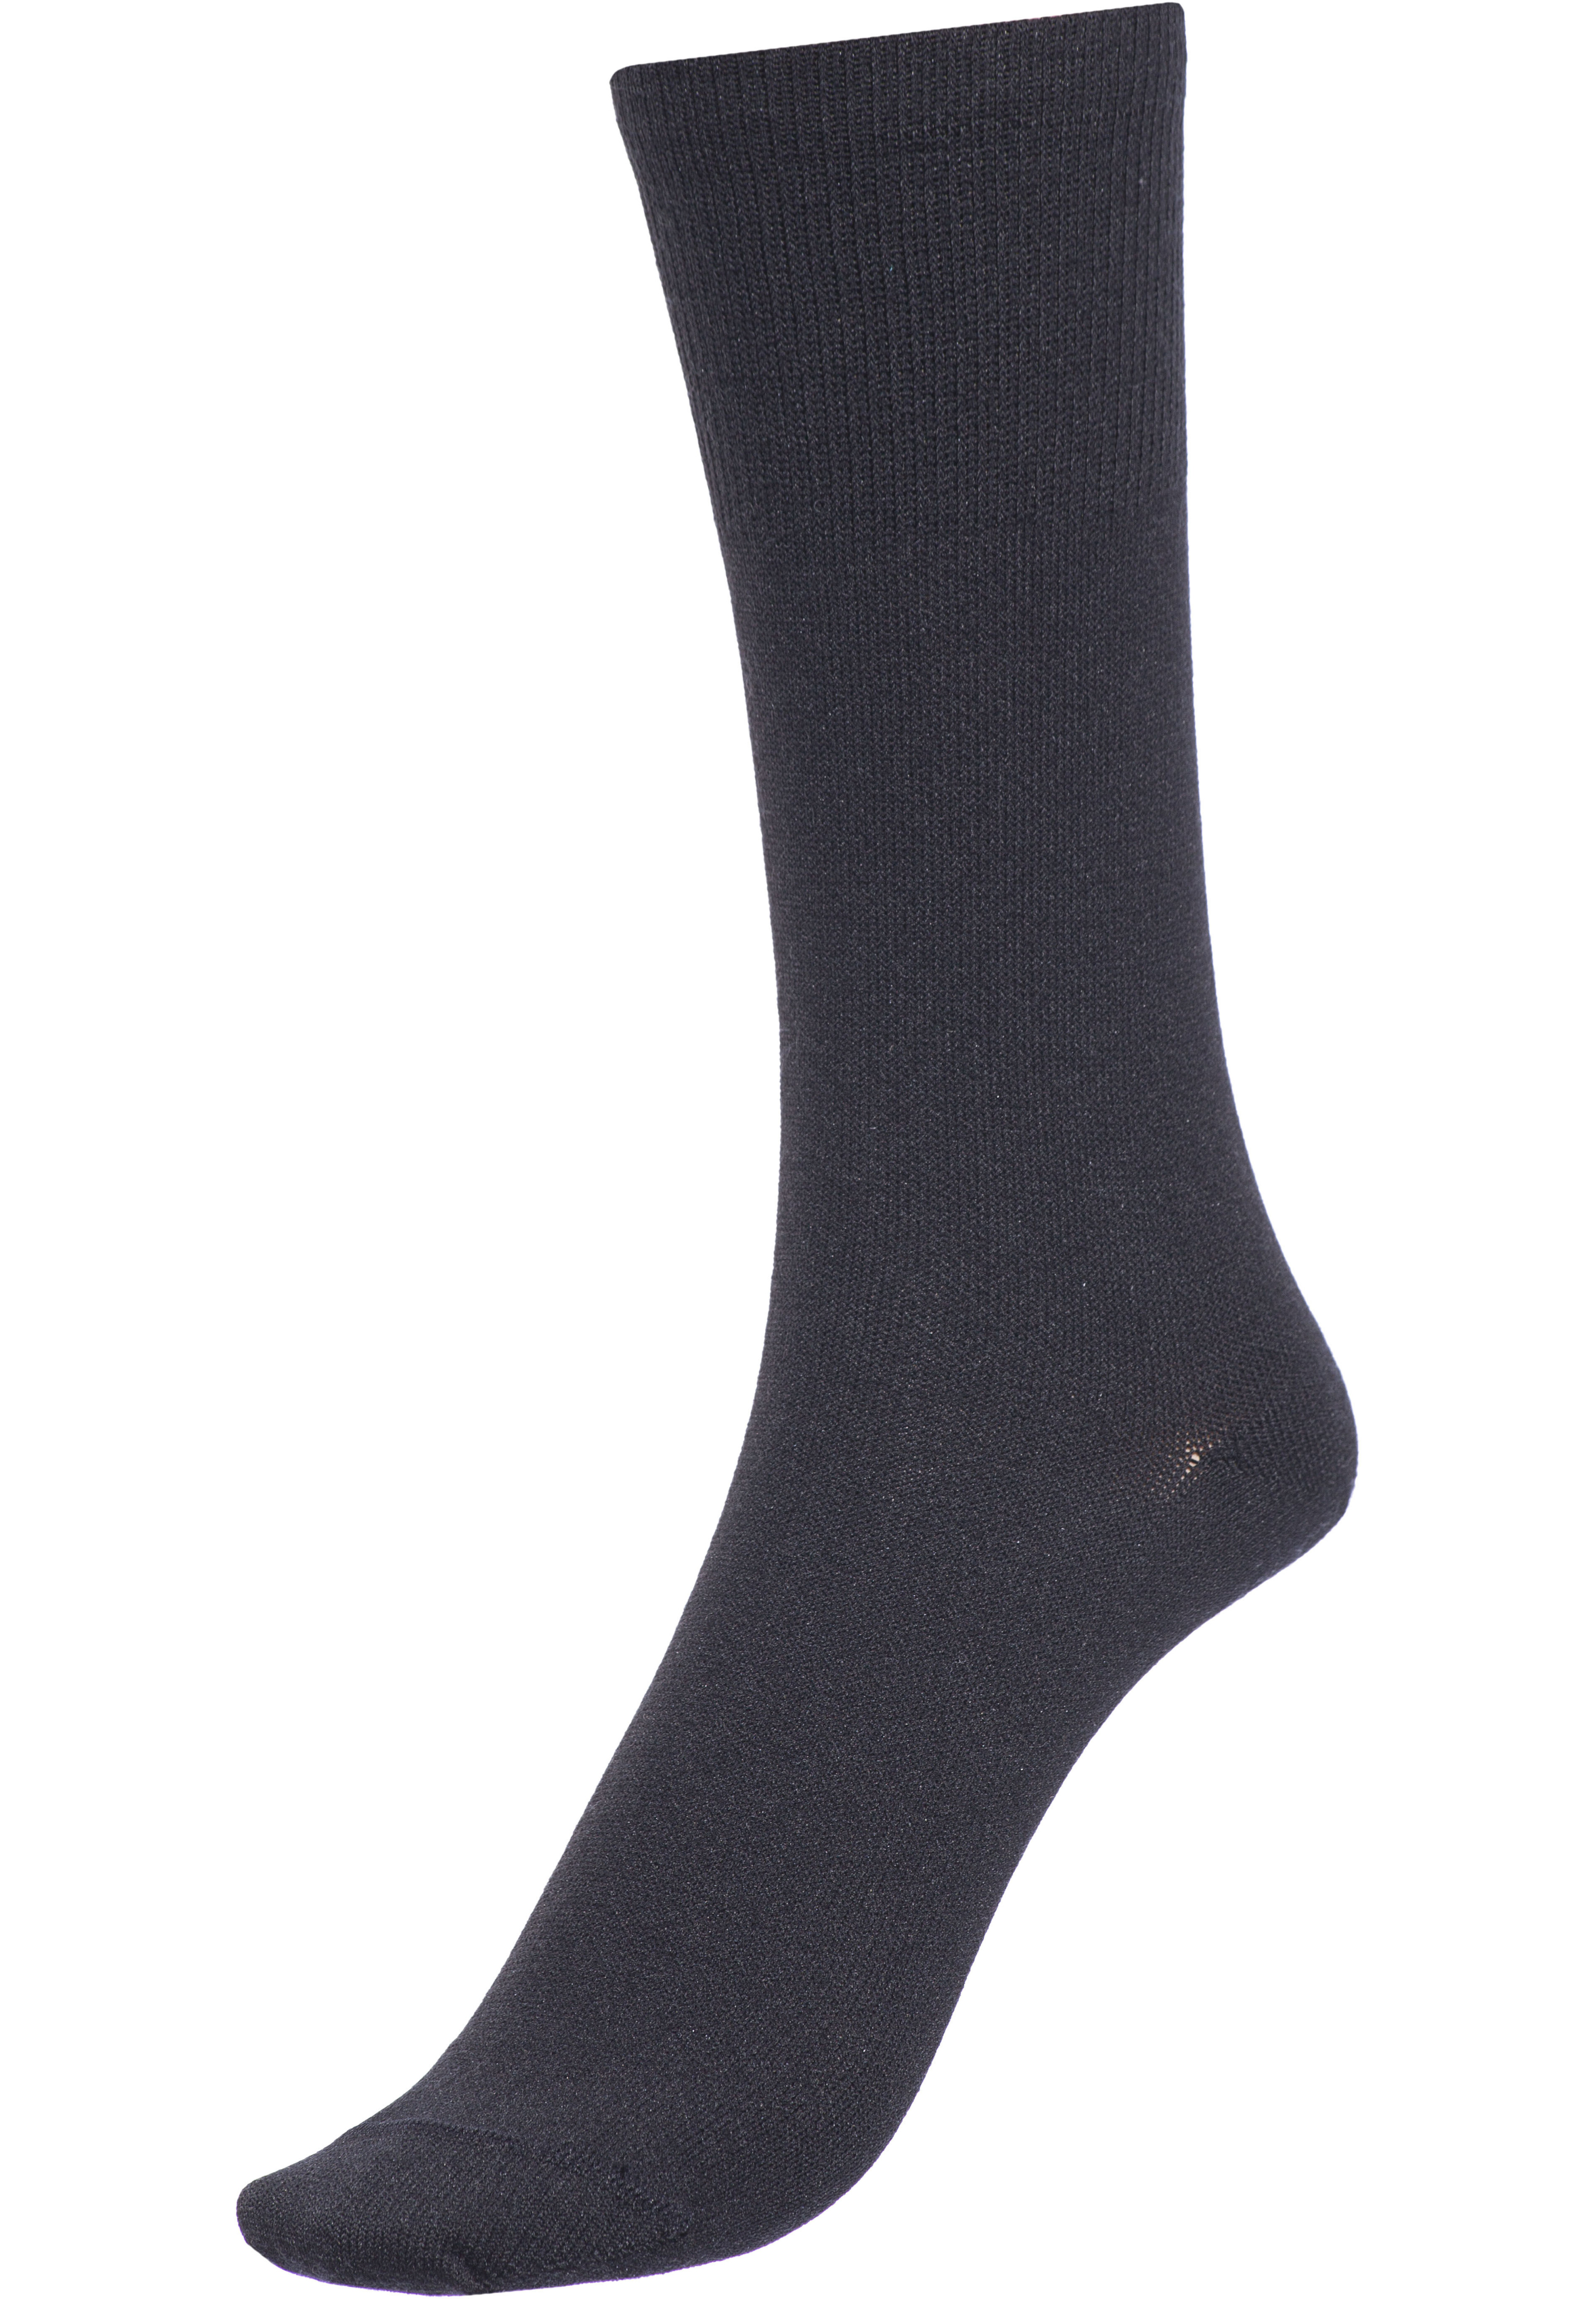 873ed8c81 Smartwool Hike Liner Crew Socks black